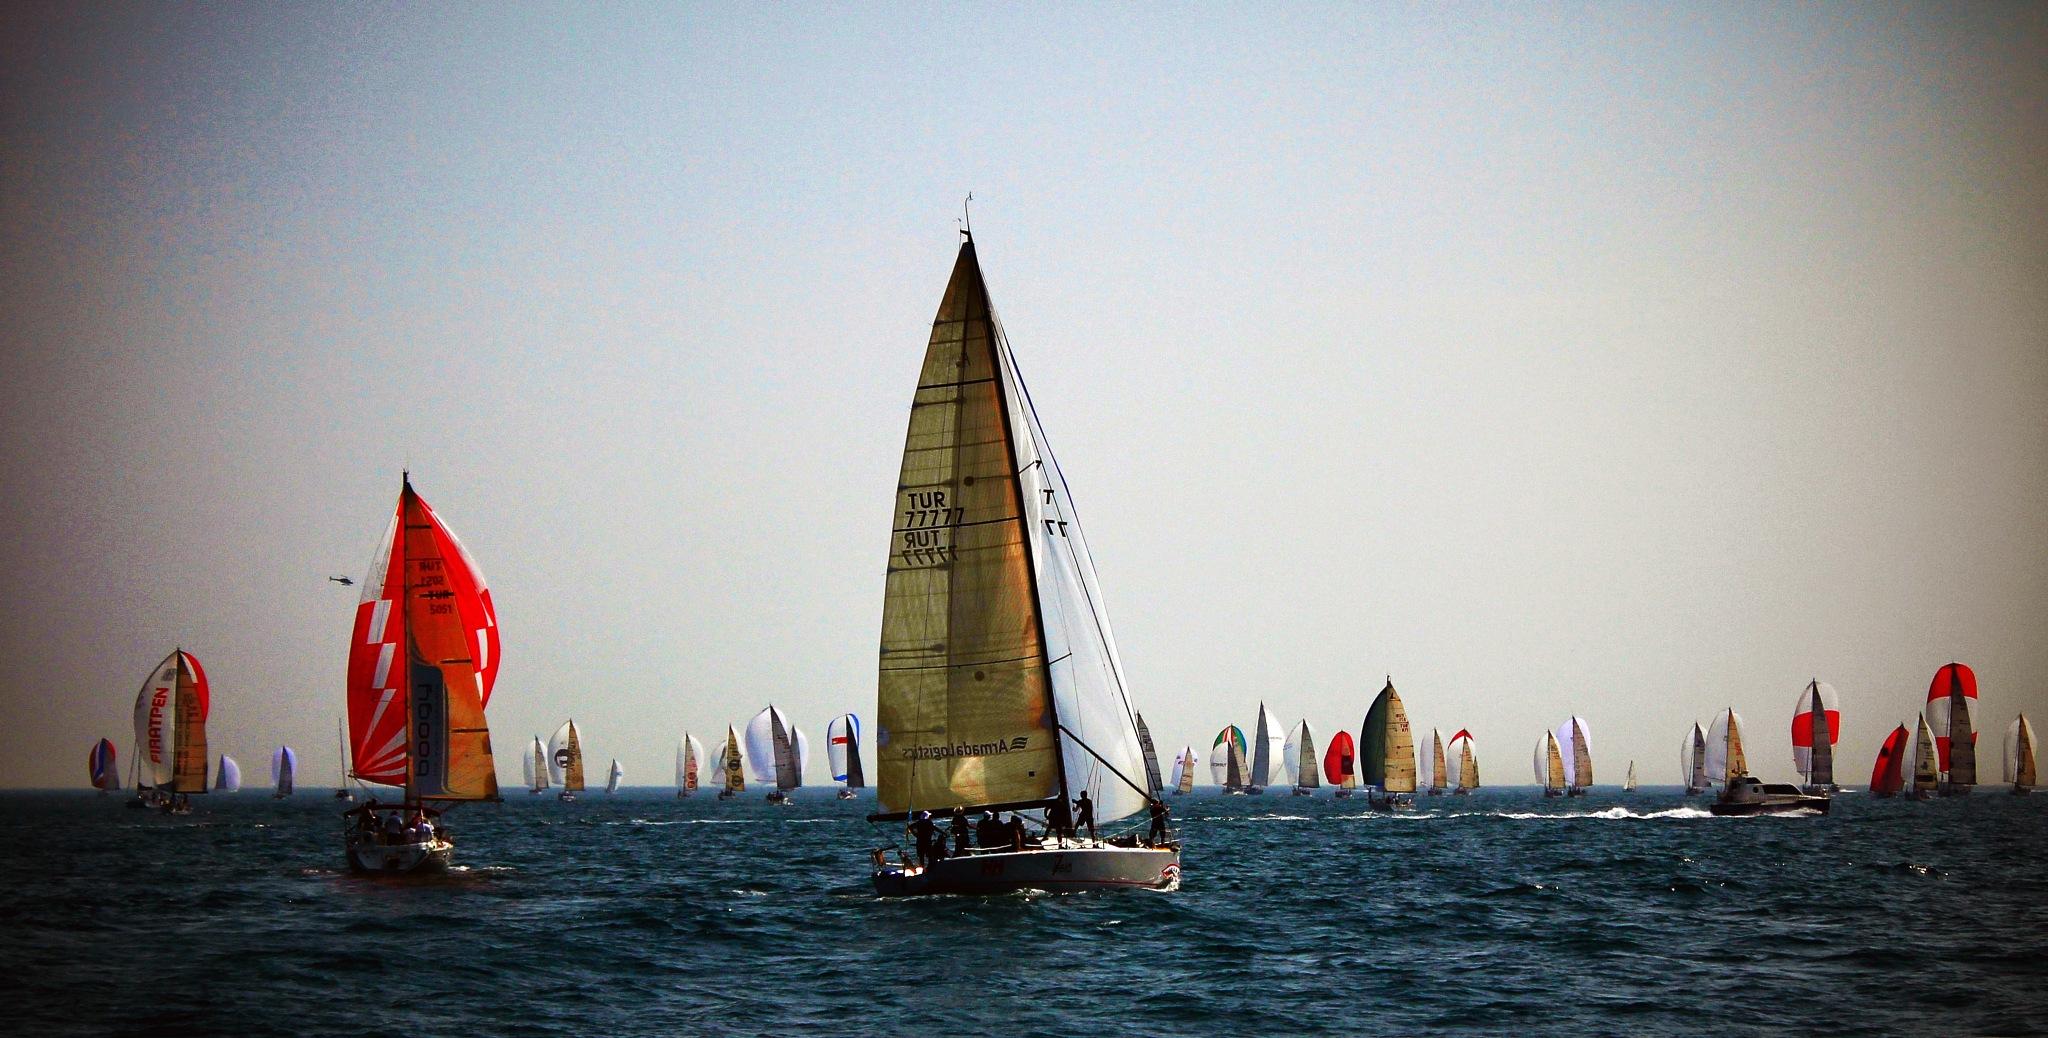 Sailboats on Bosphorus by Engin Dikkulak